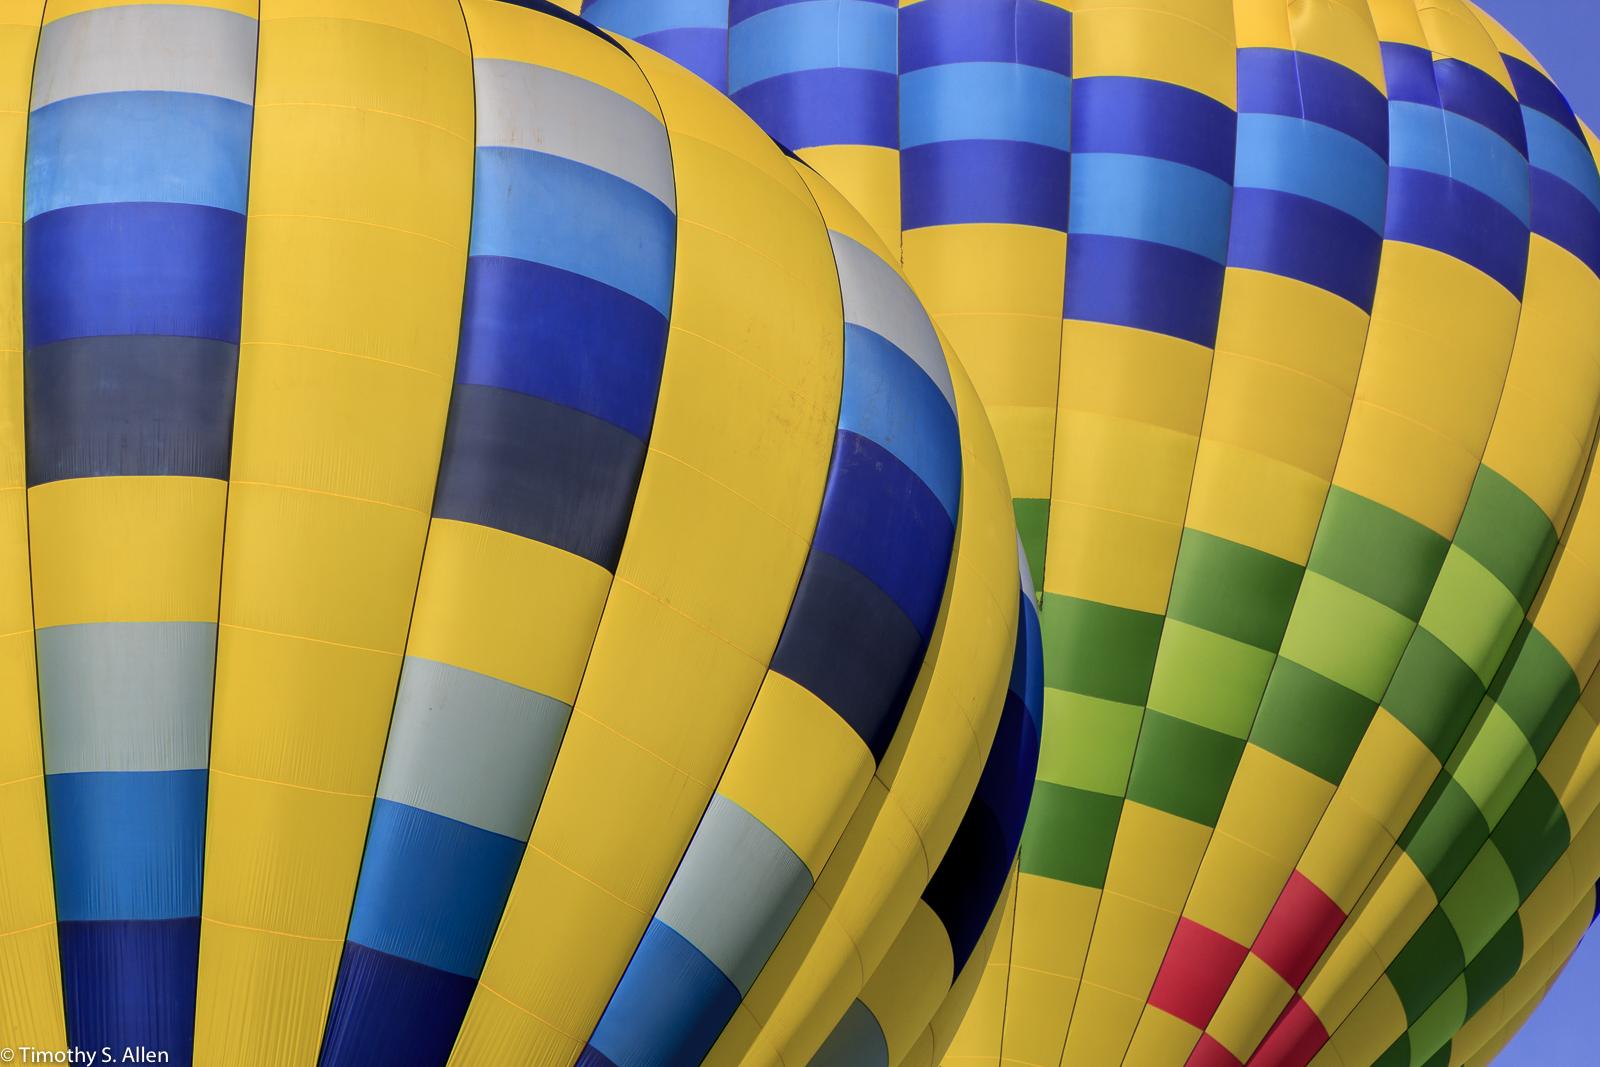 Sonoma County Hot Air Balloon Classic Windsor, CA, U.S.A. June 30, 2014